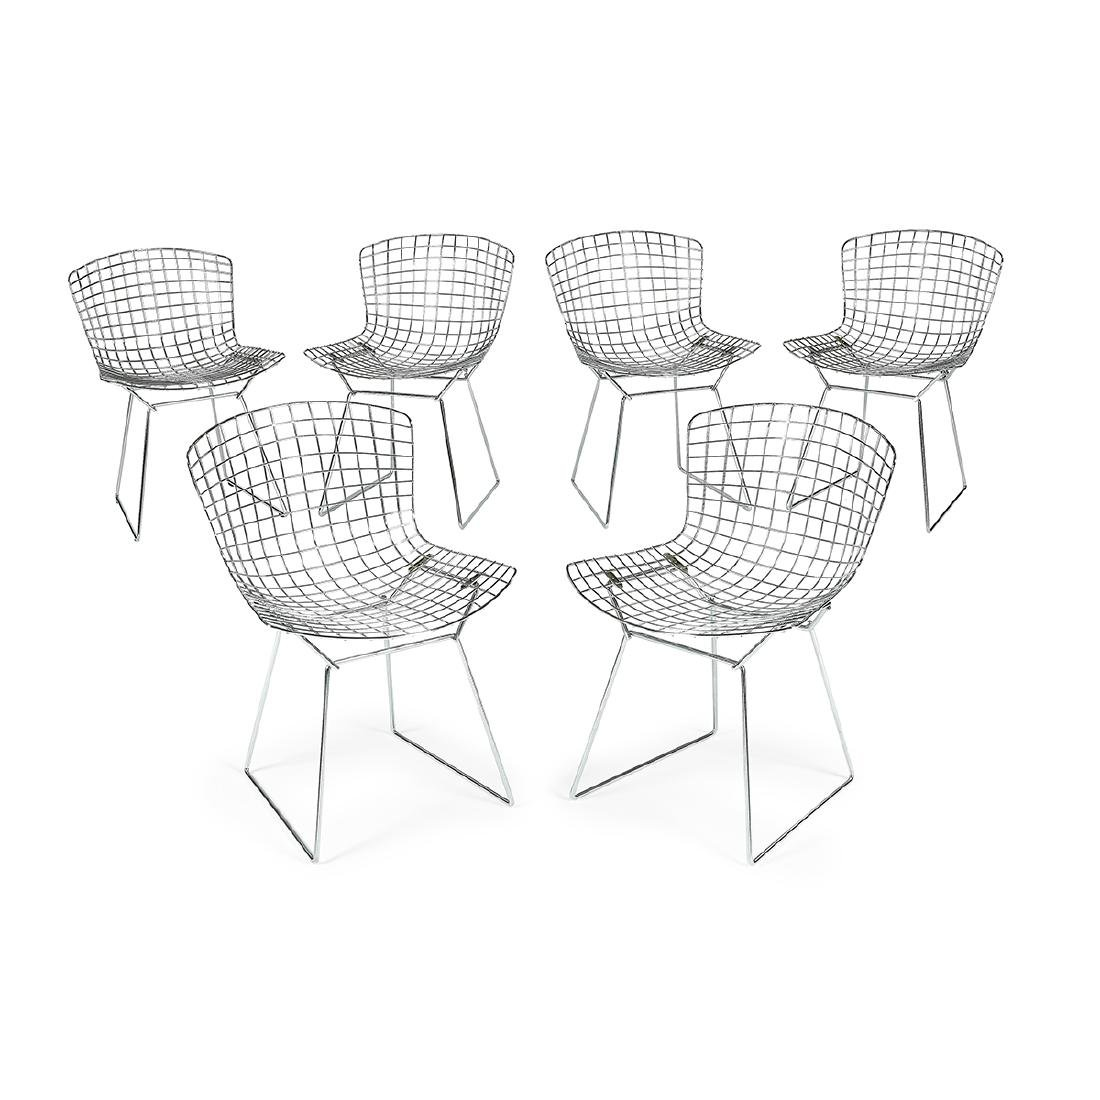 Harry Bertoia for Knoll Bertoia Side Chair, six